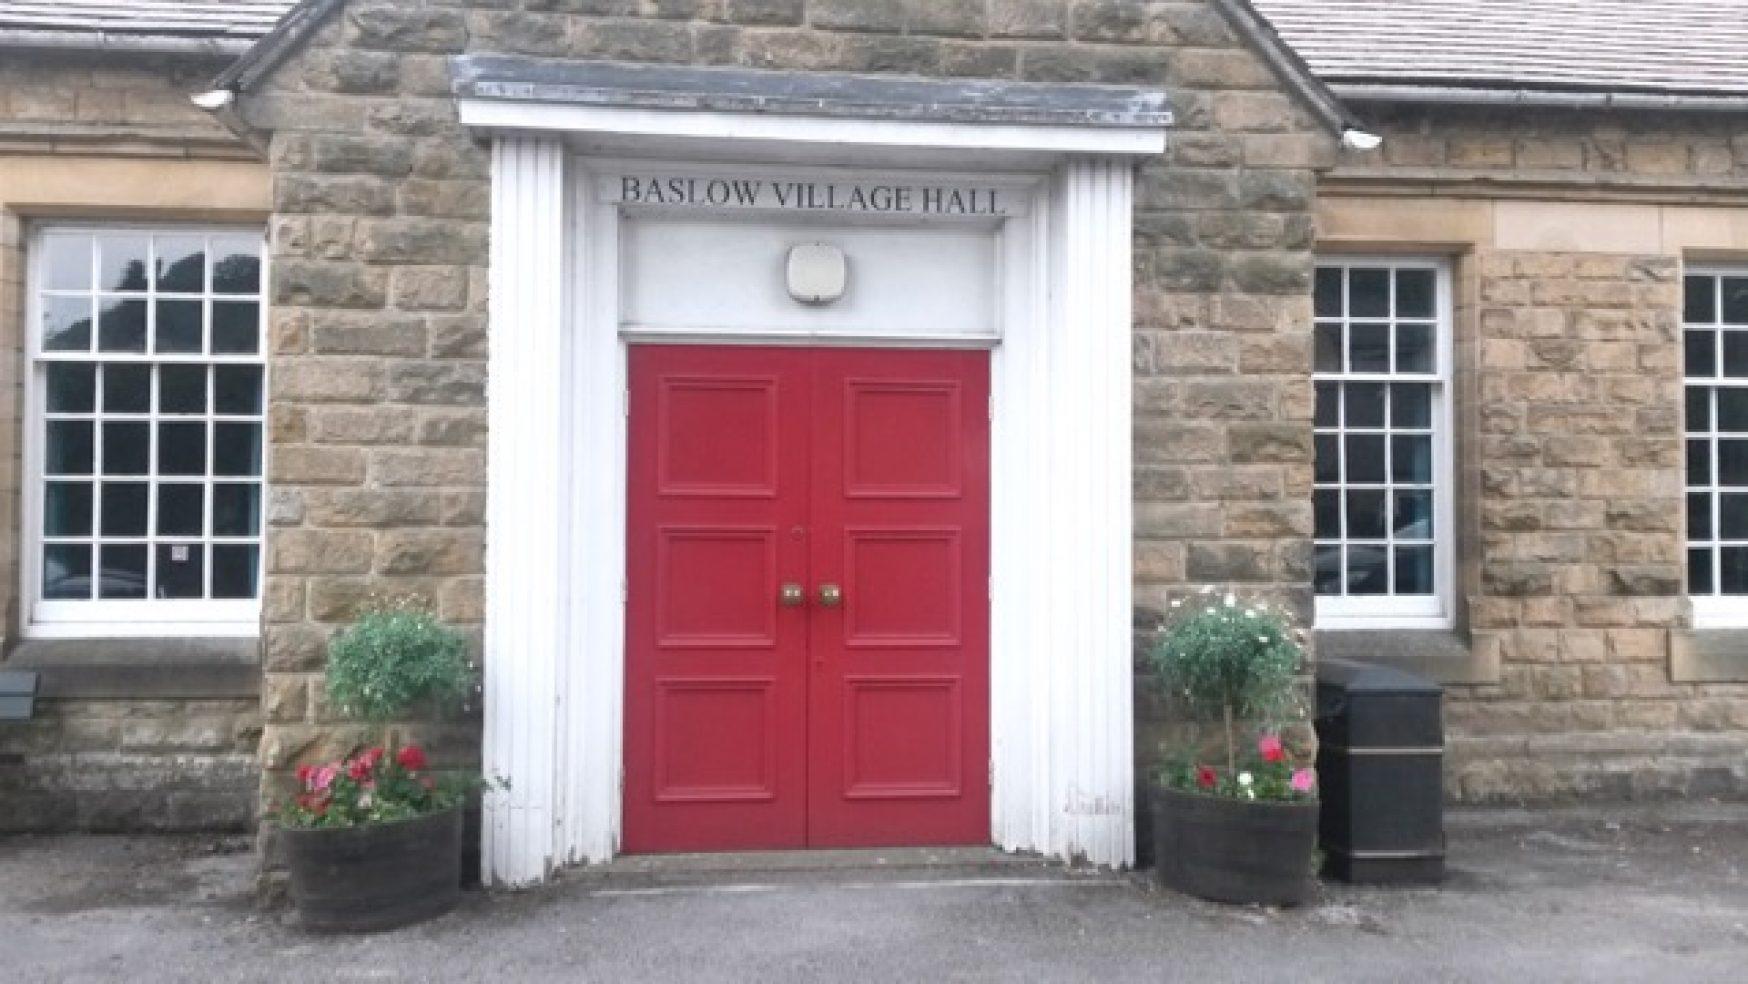 Baslow Village Hall